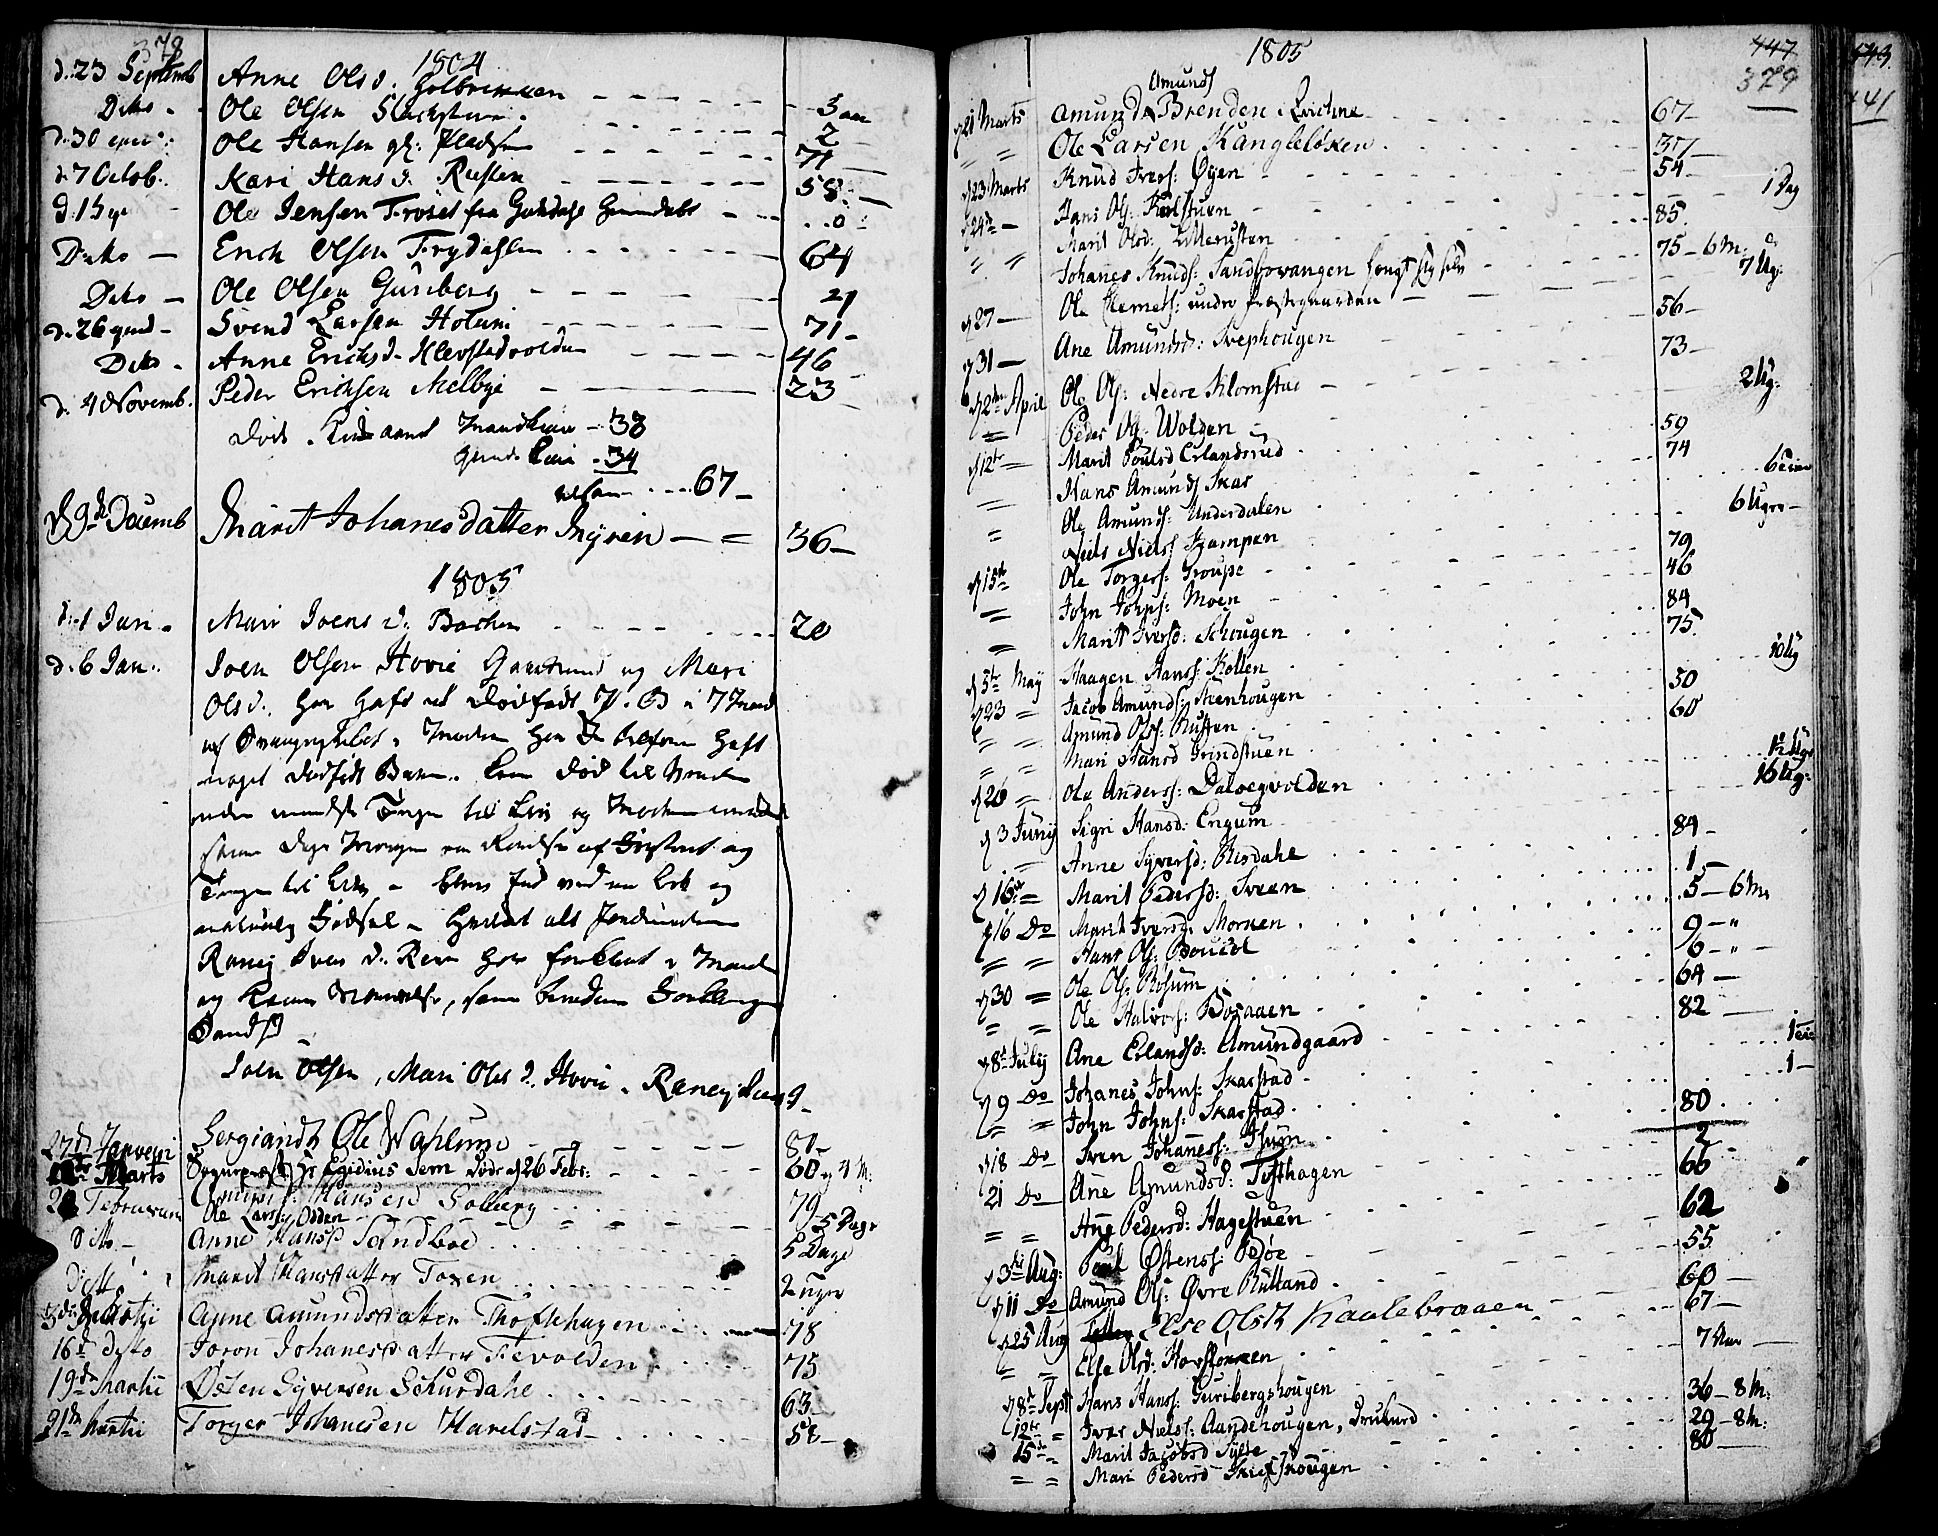 SAH, Fron prestekontor, H/Ha/Haa/L0001: Ministerialbok nr. 1, 1799-1816, s. 378-379